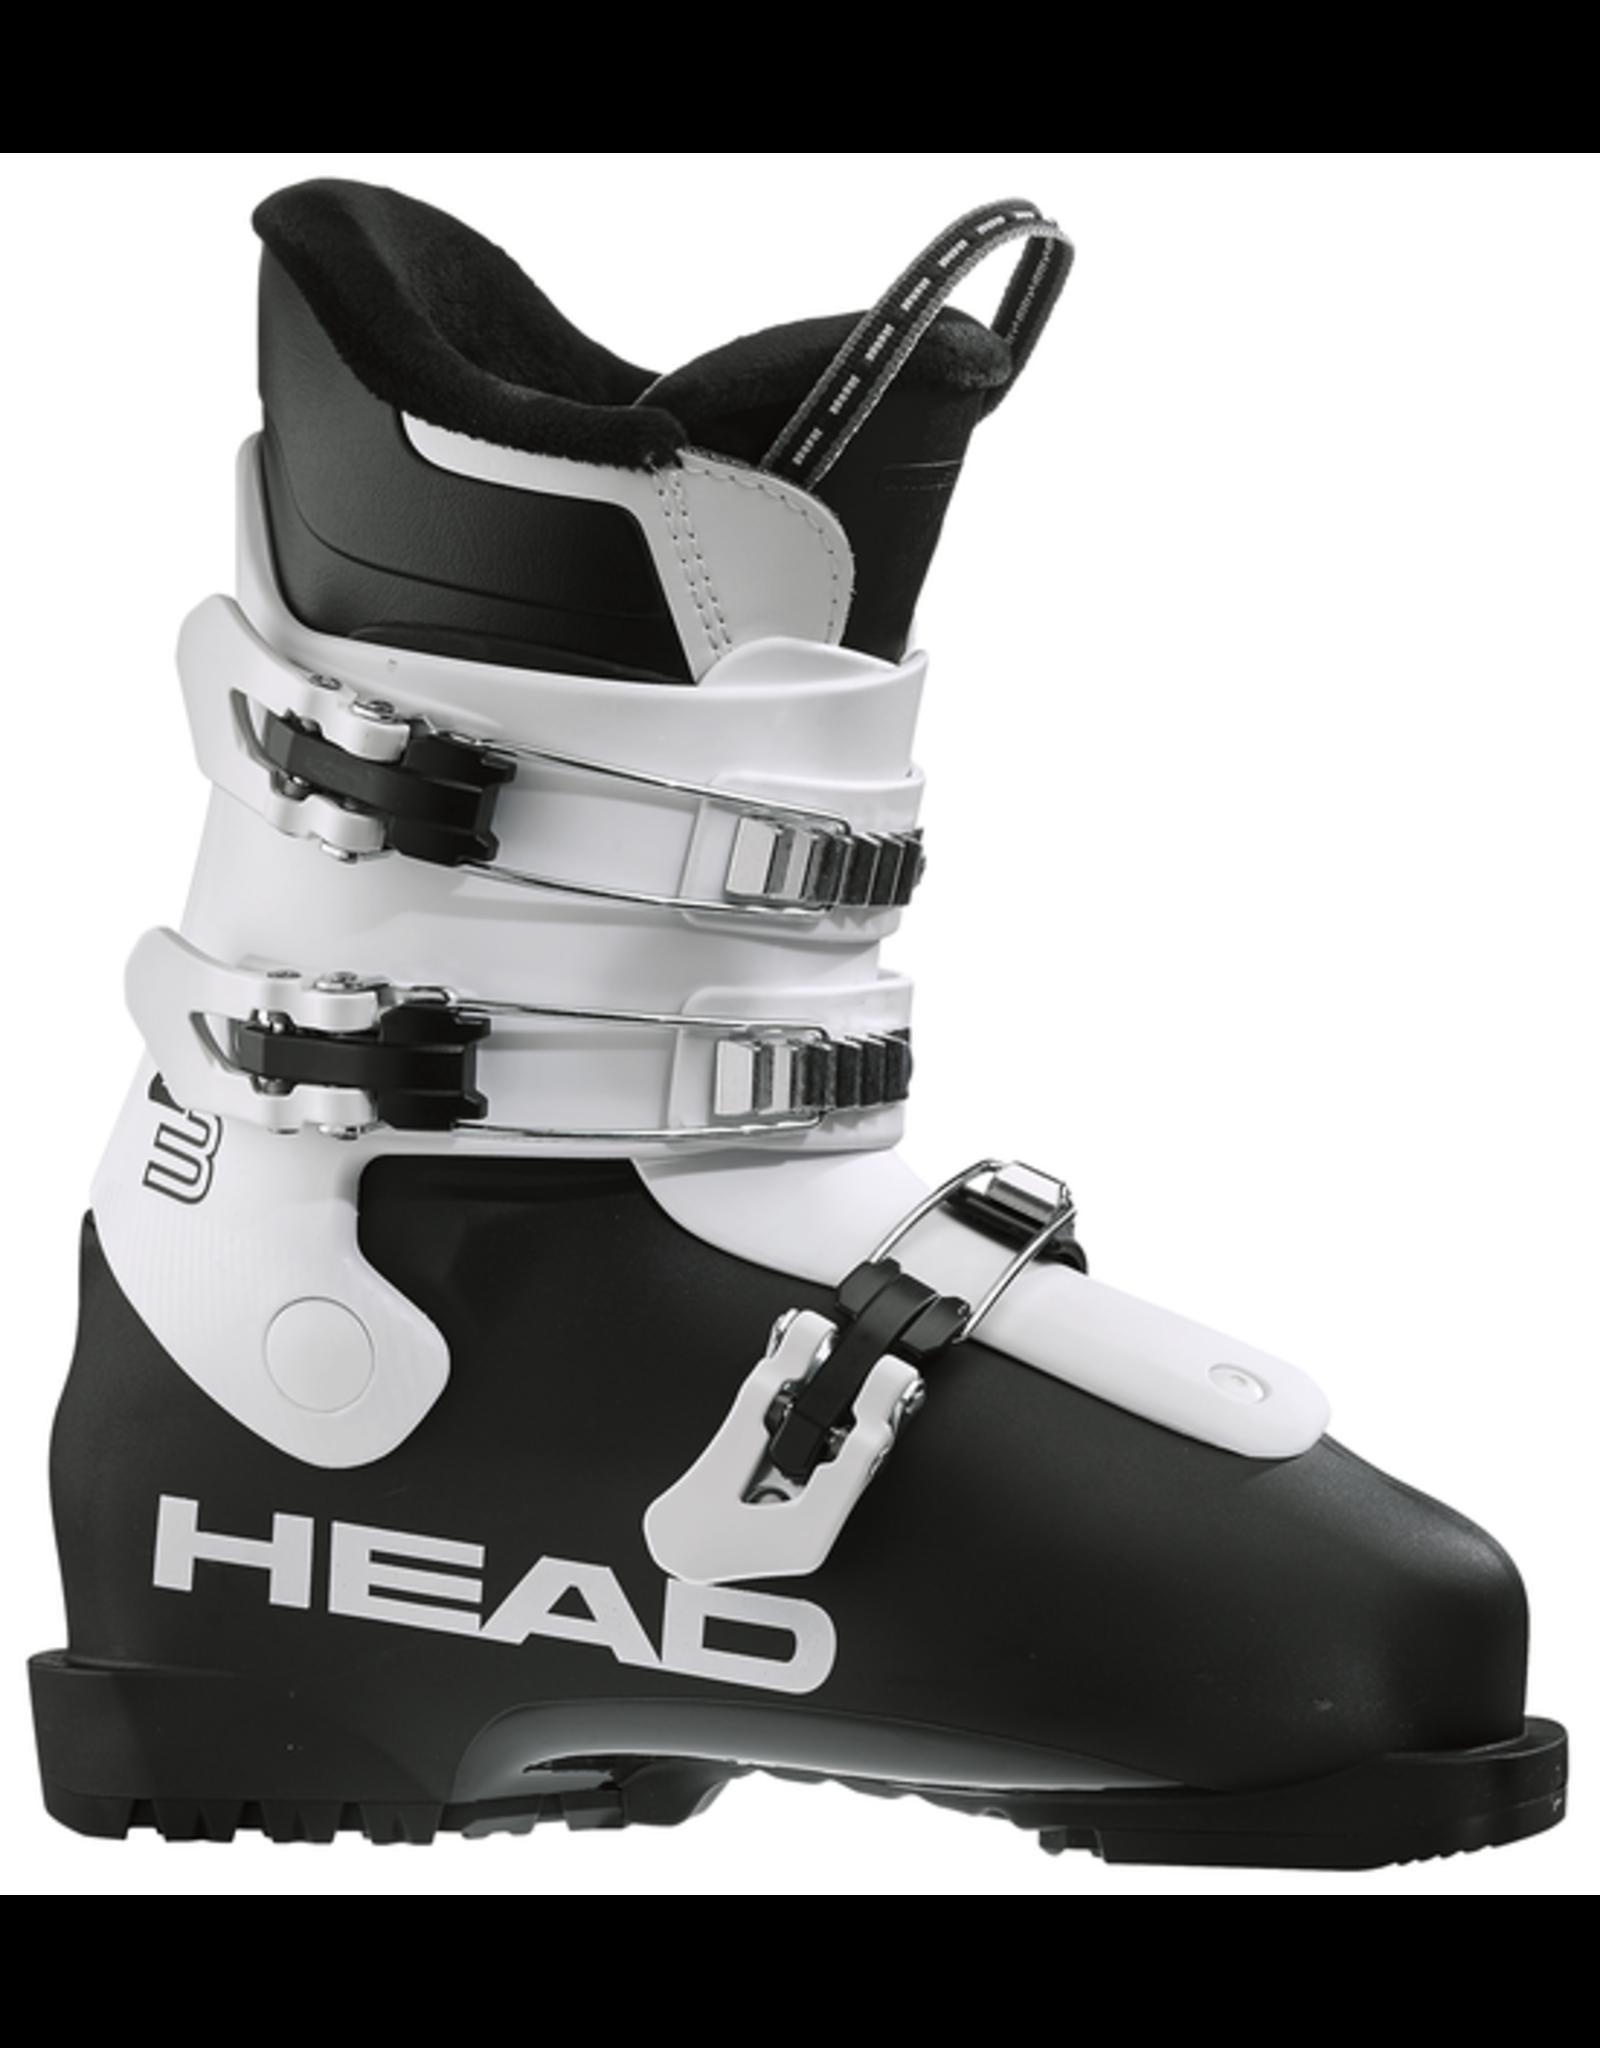 HEAD HEAD Z3 BLACK/WHITE  ALPINE SKI BOOT JR 20